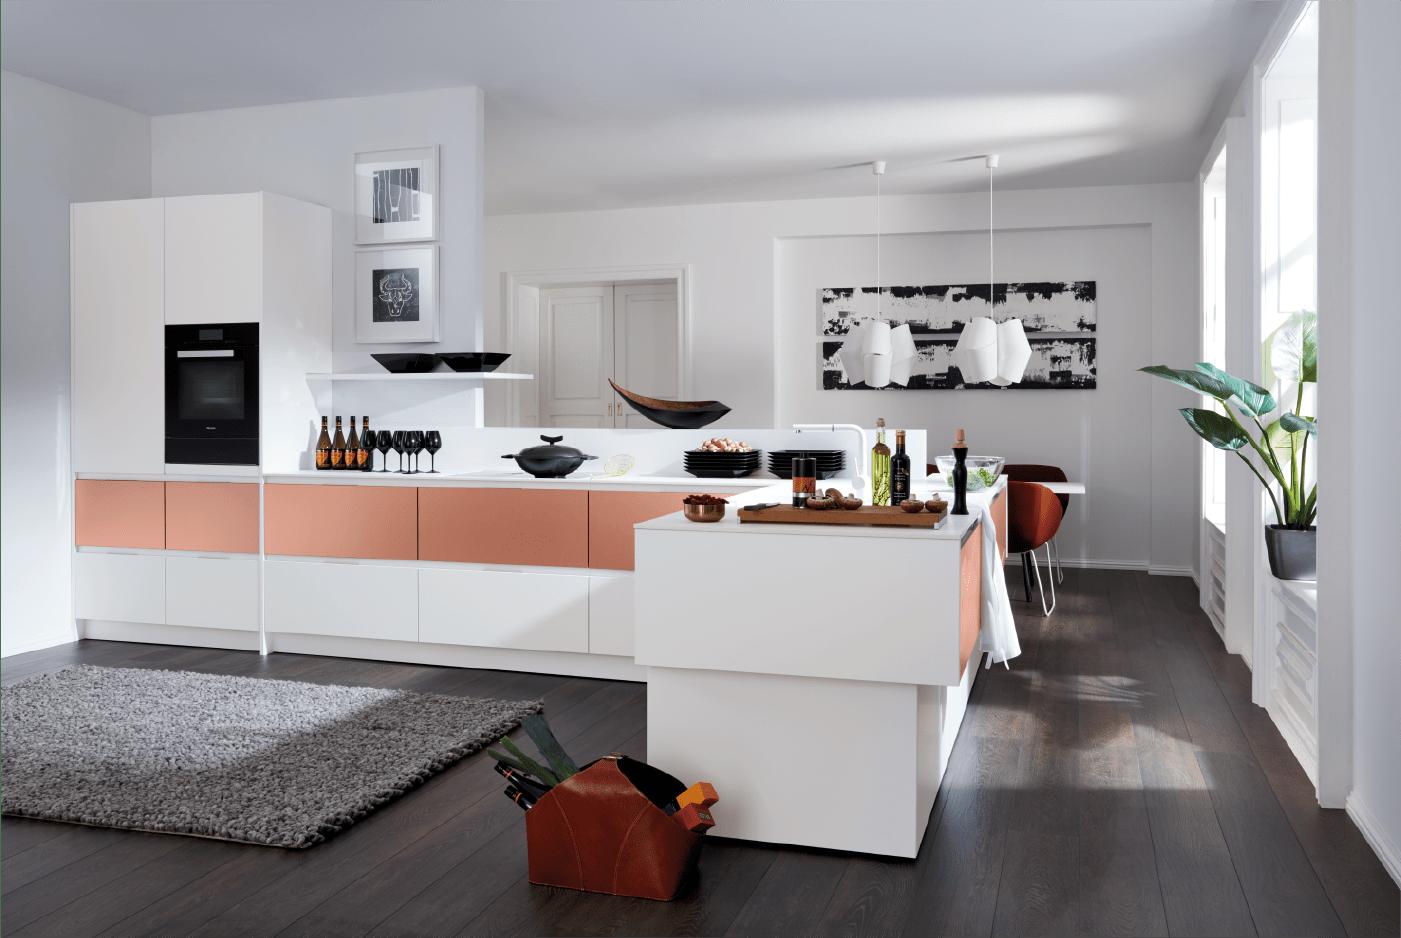 Cabeo-keukens-2-keuken-foto-2